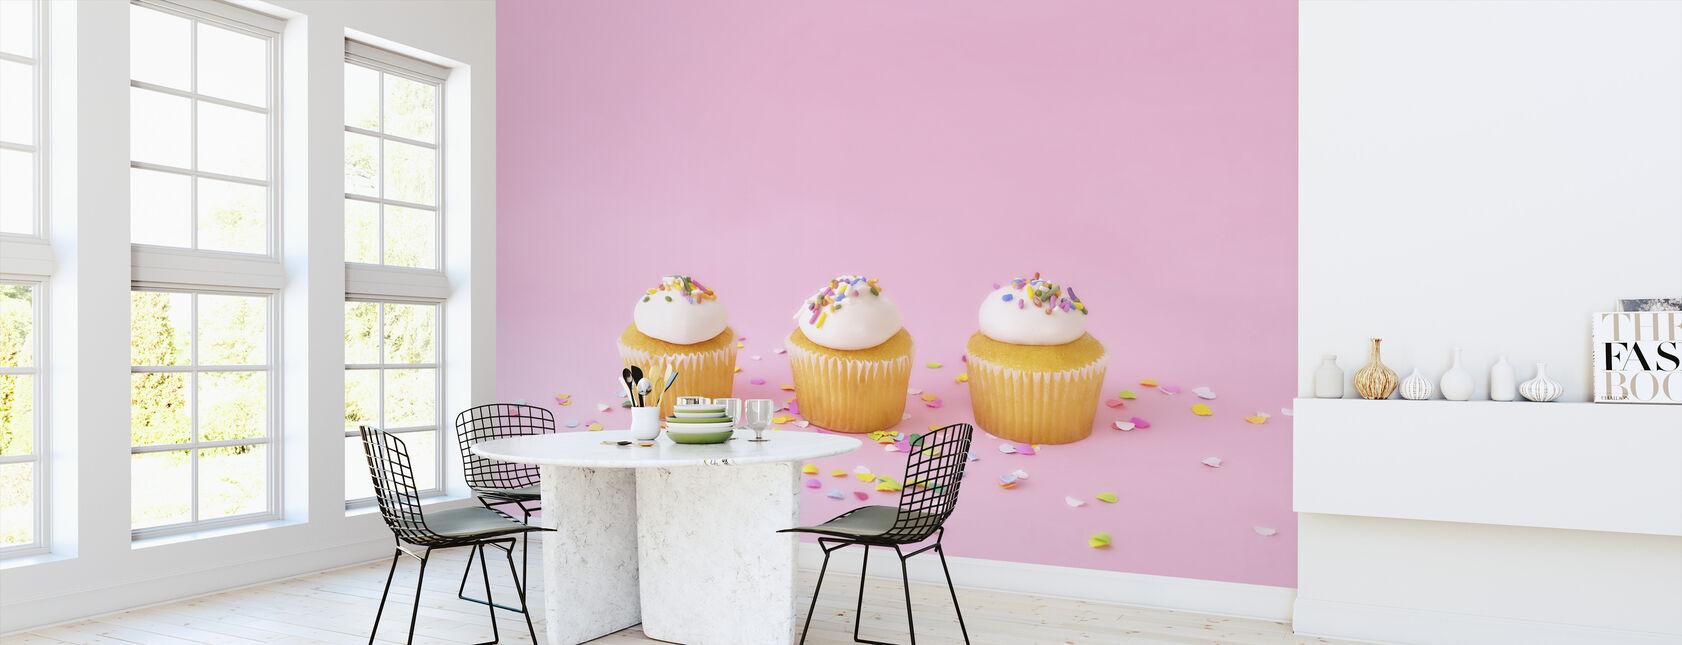 Frostat muffins - Tapet - Kök